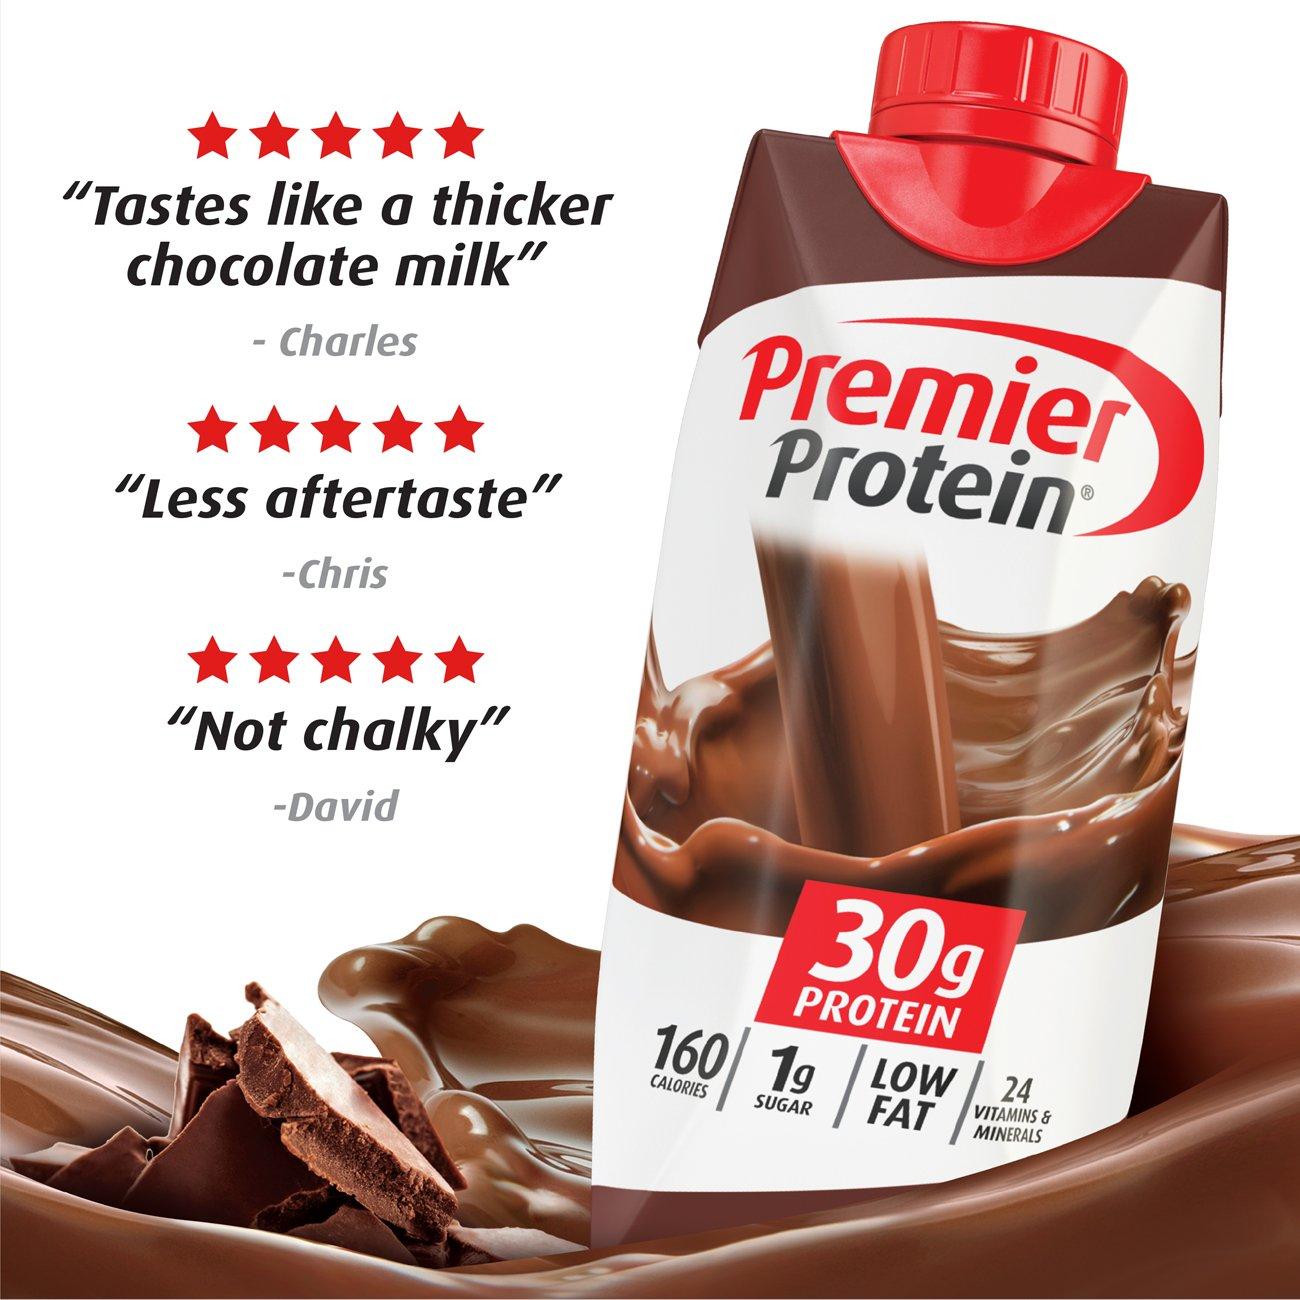 Amazon.com: Premier Protein 30g Protein Shake (Pack of 4 x 11 fl ...